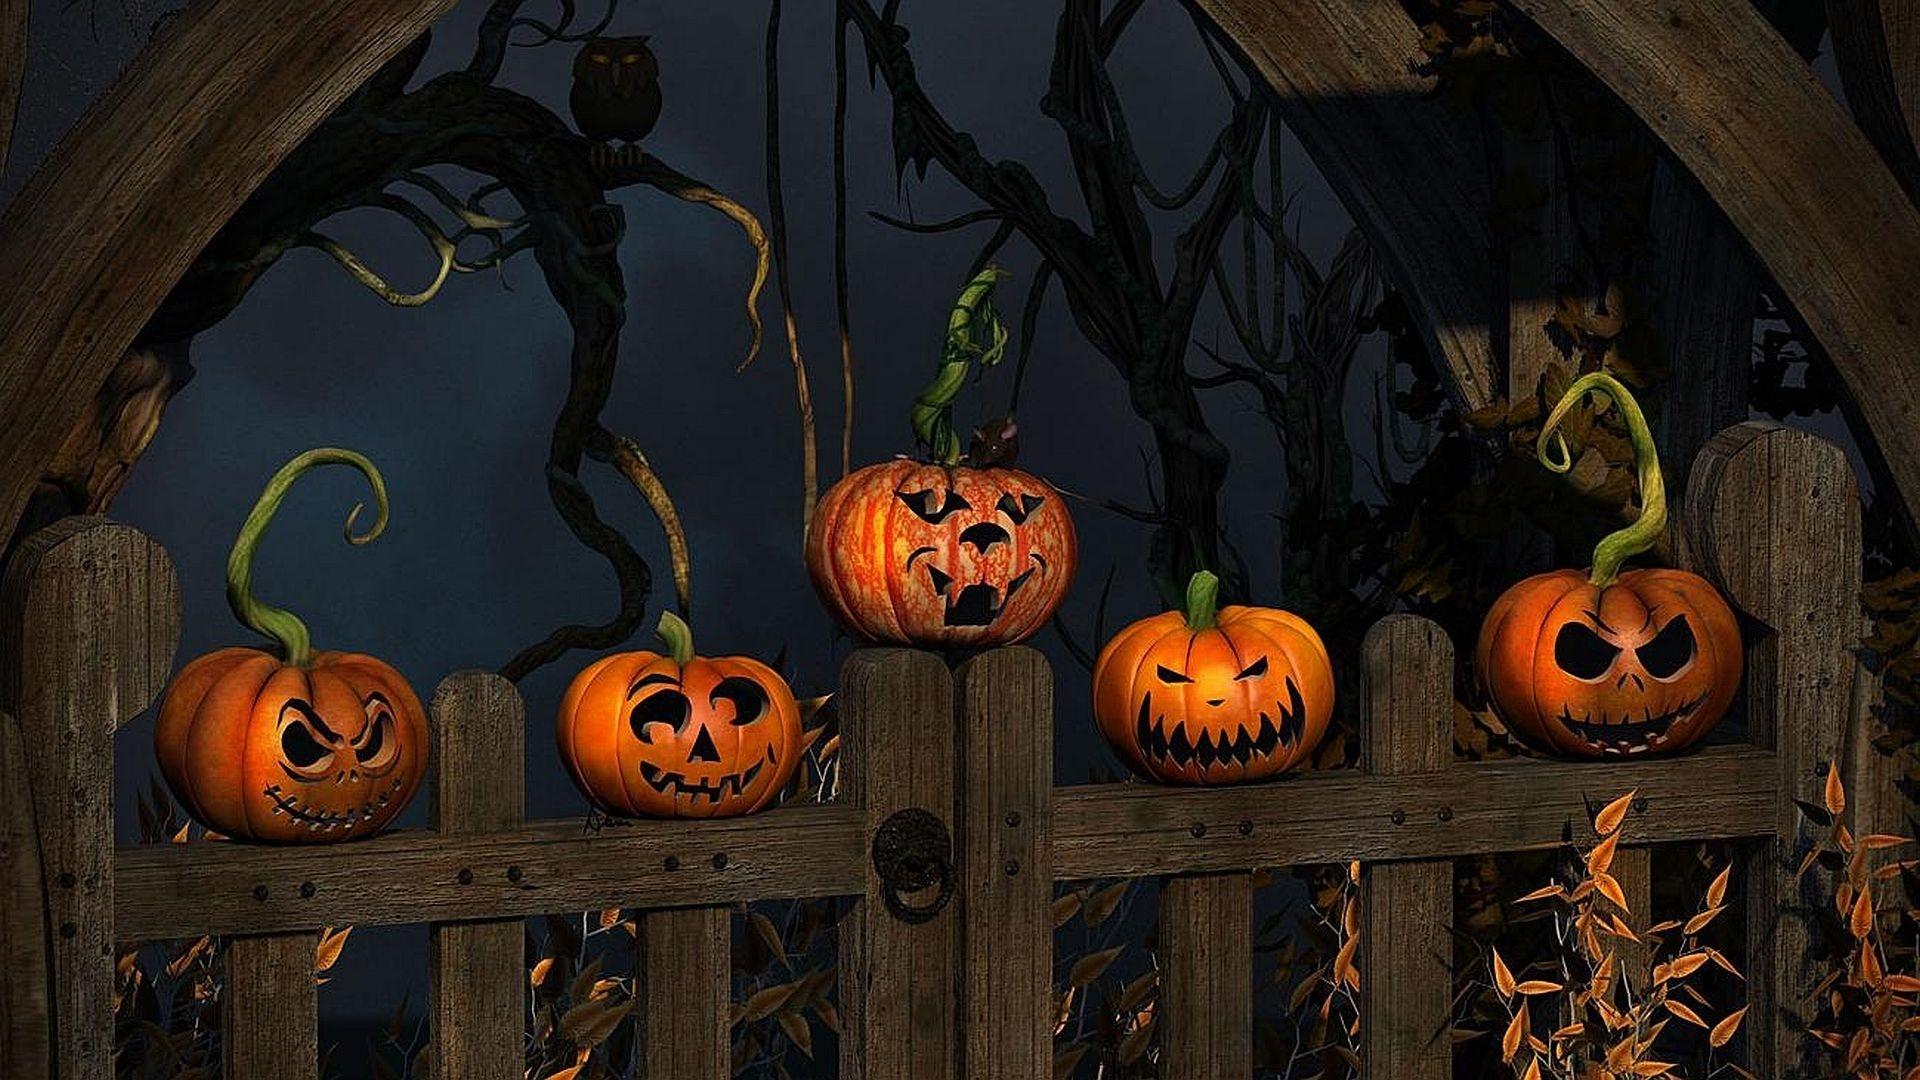 Halloween Pumpkin Wallpaper Picture hd